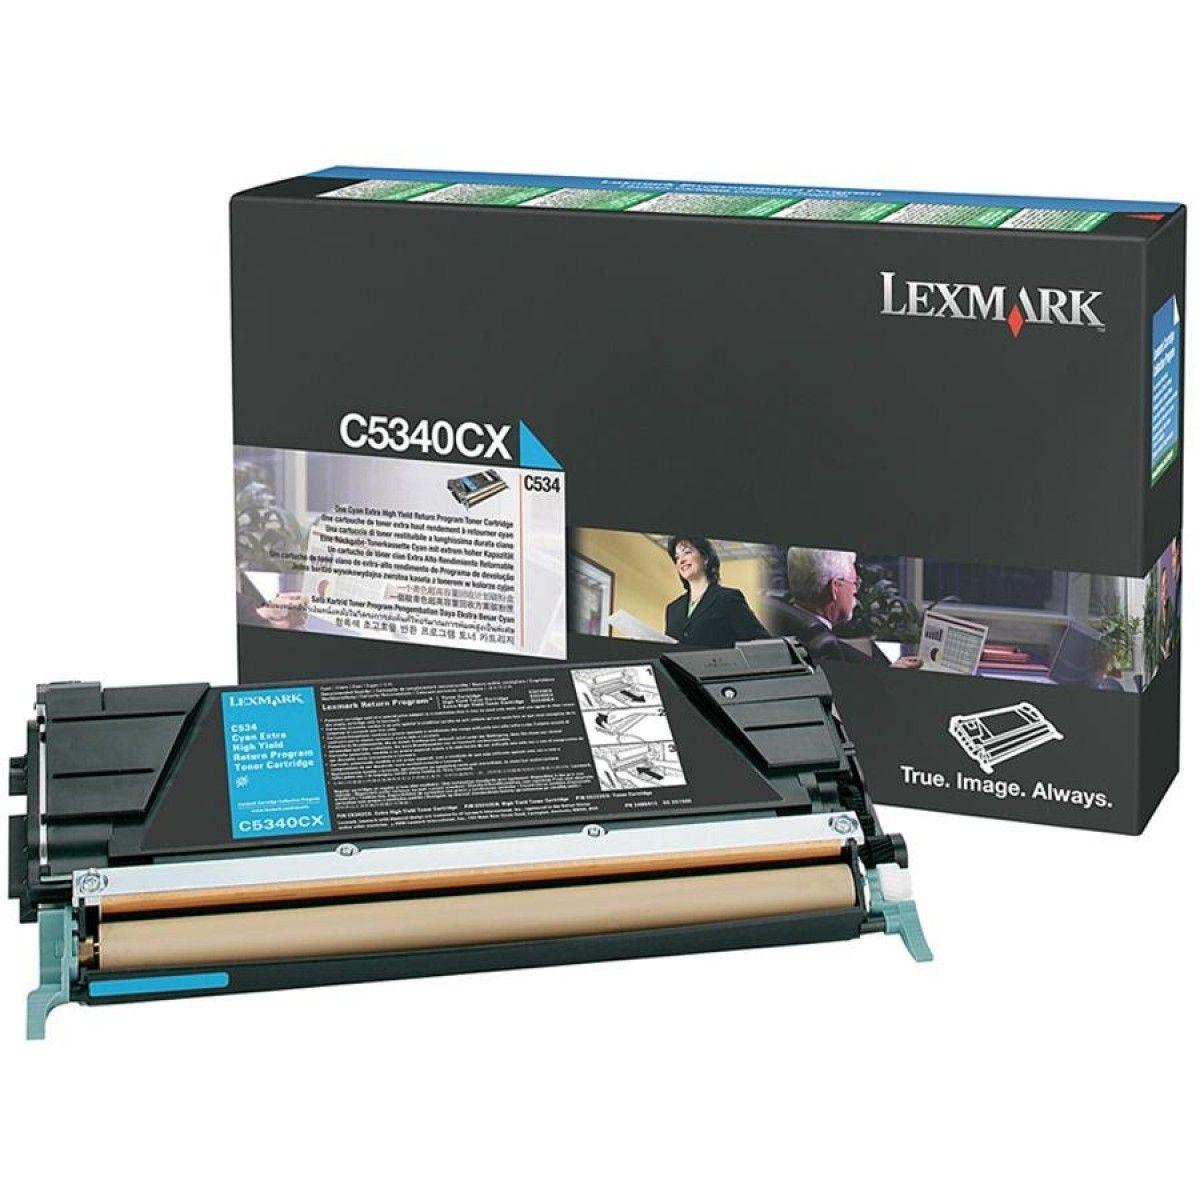 Toner Lexmark C534 Ciano - C5340CX